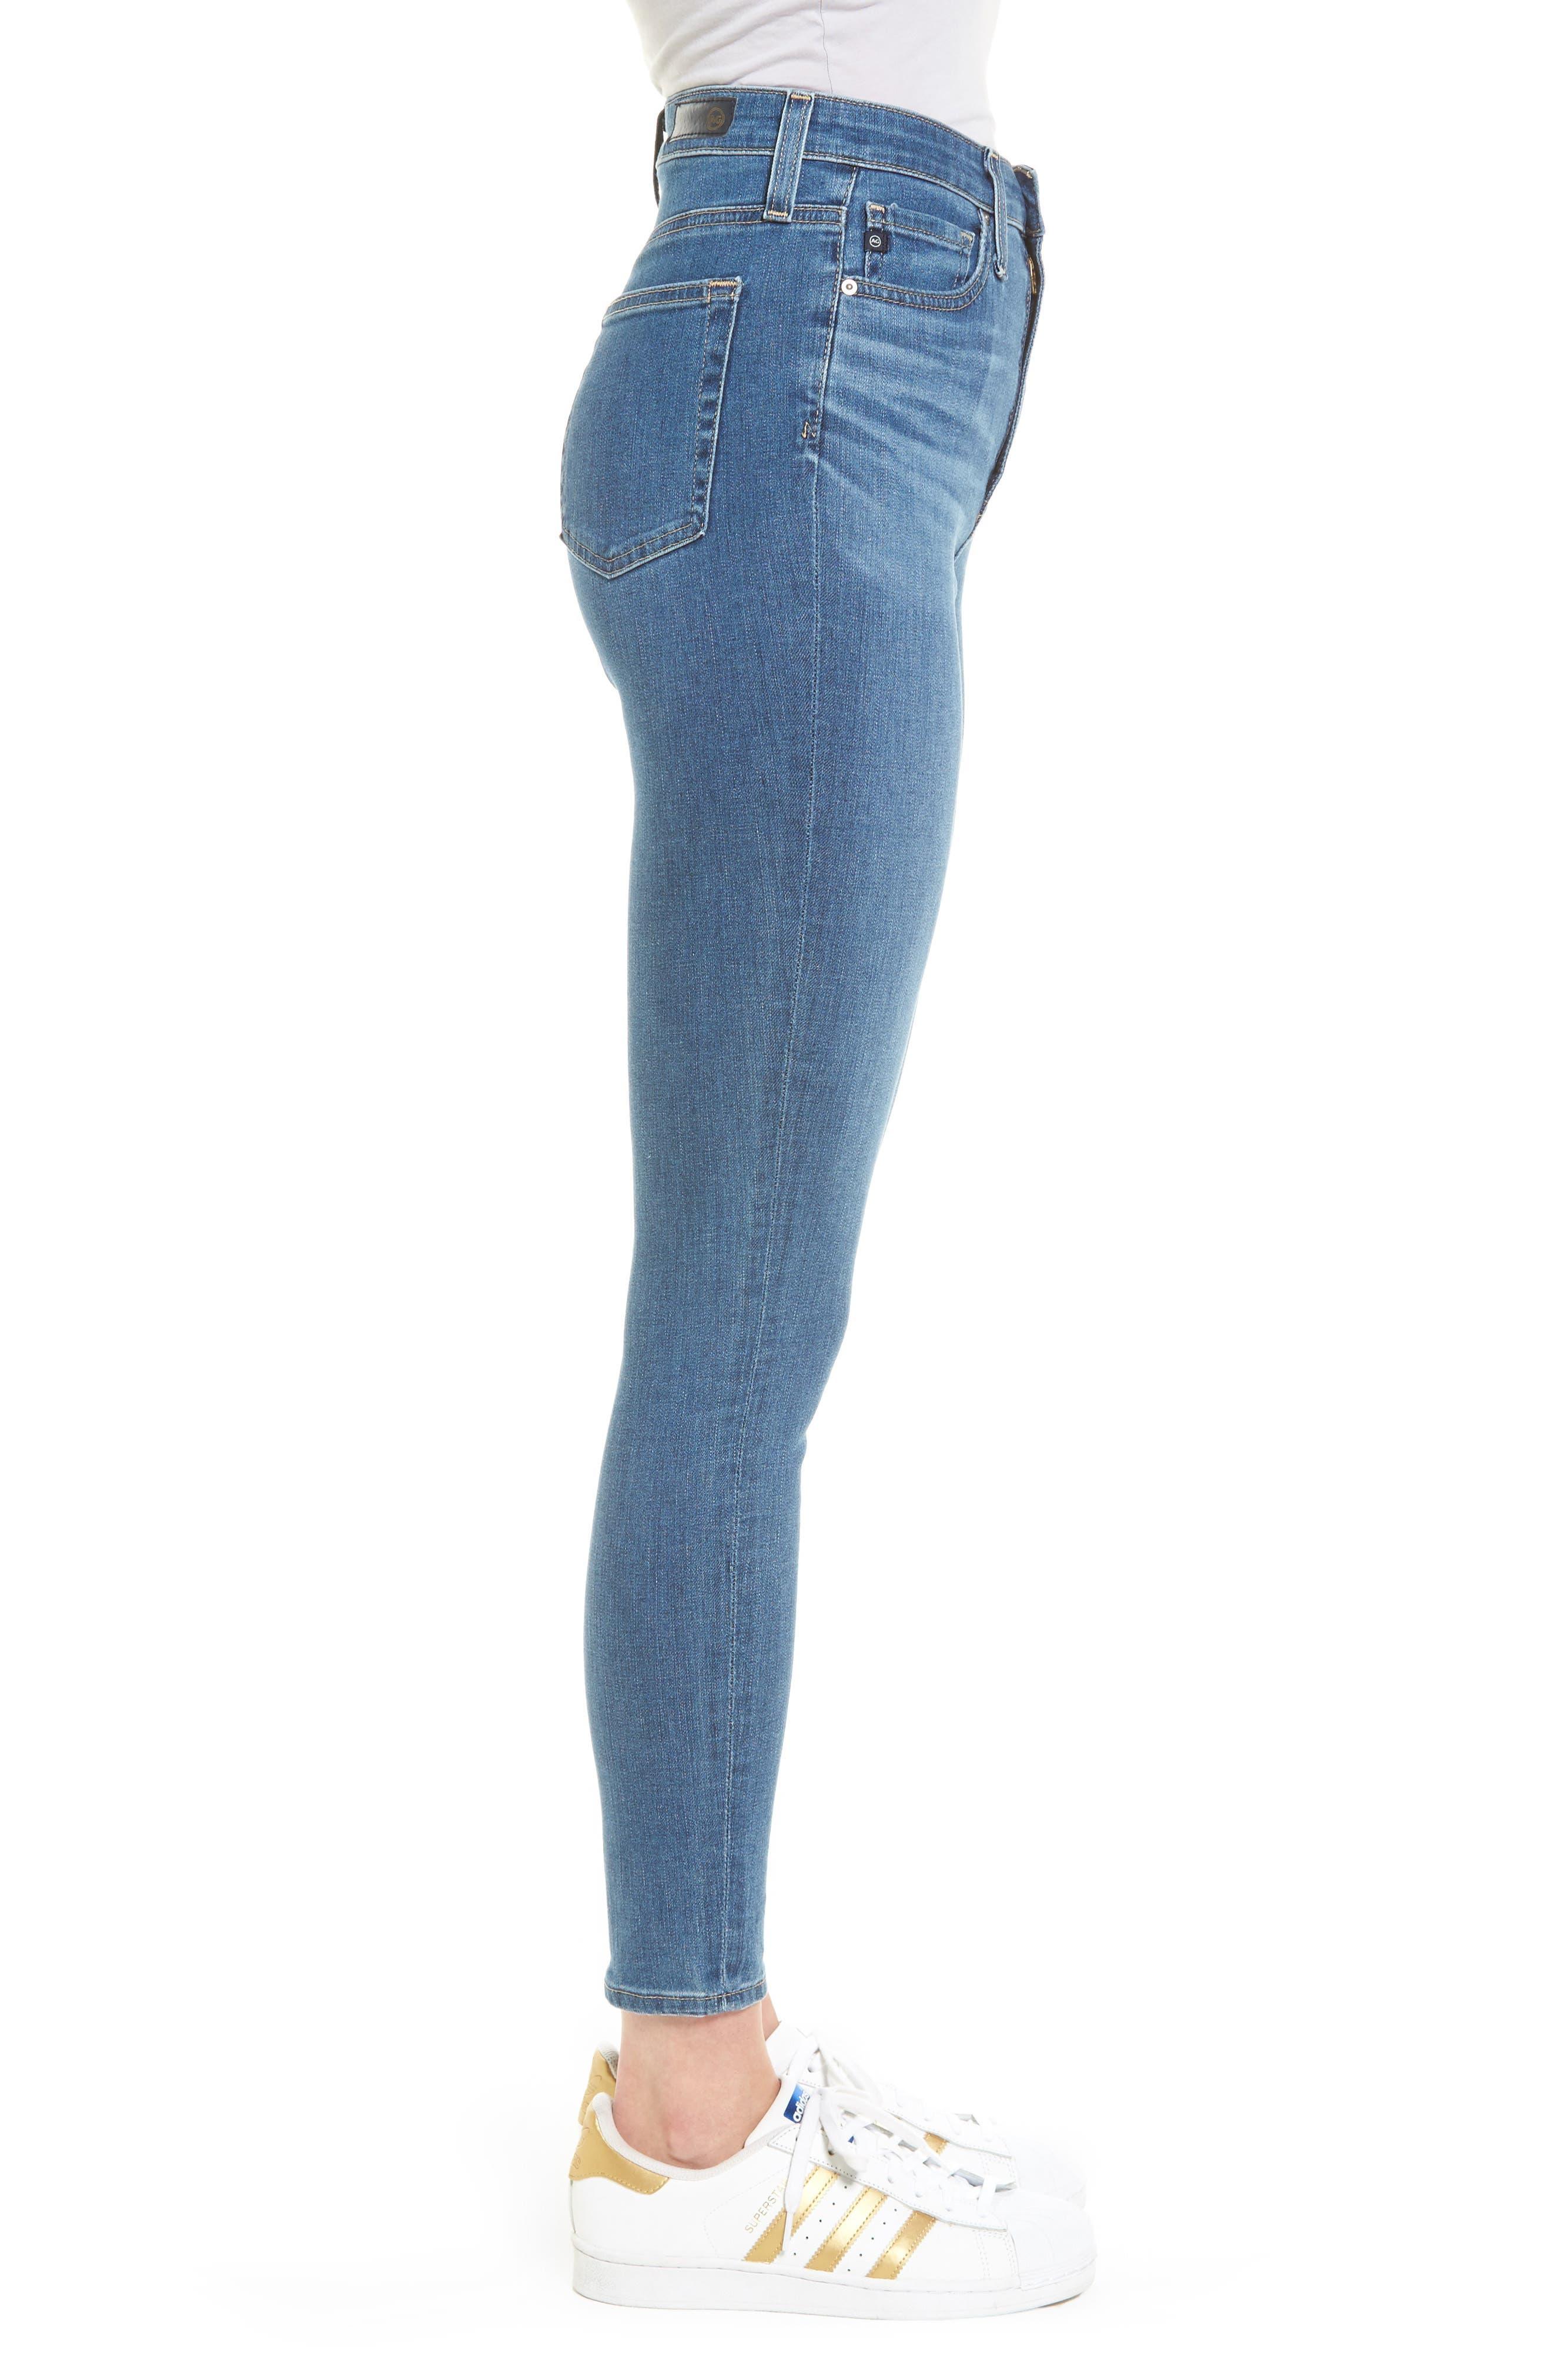 Mila High Waist Ankle Skinny Jeans,                             Alternate thumbnail 3, color,                             Indigo Viking